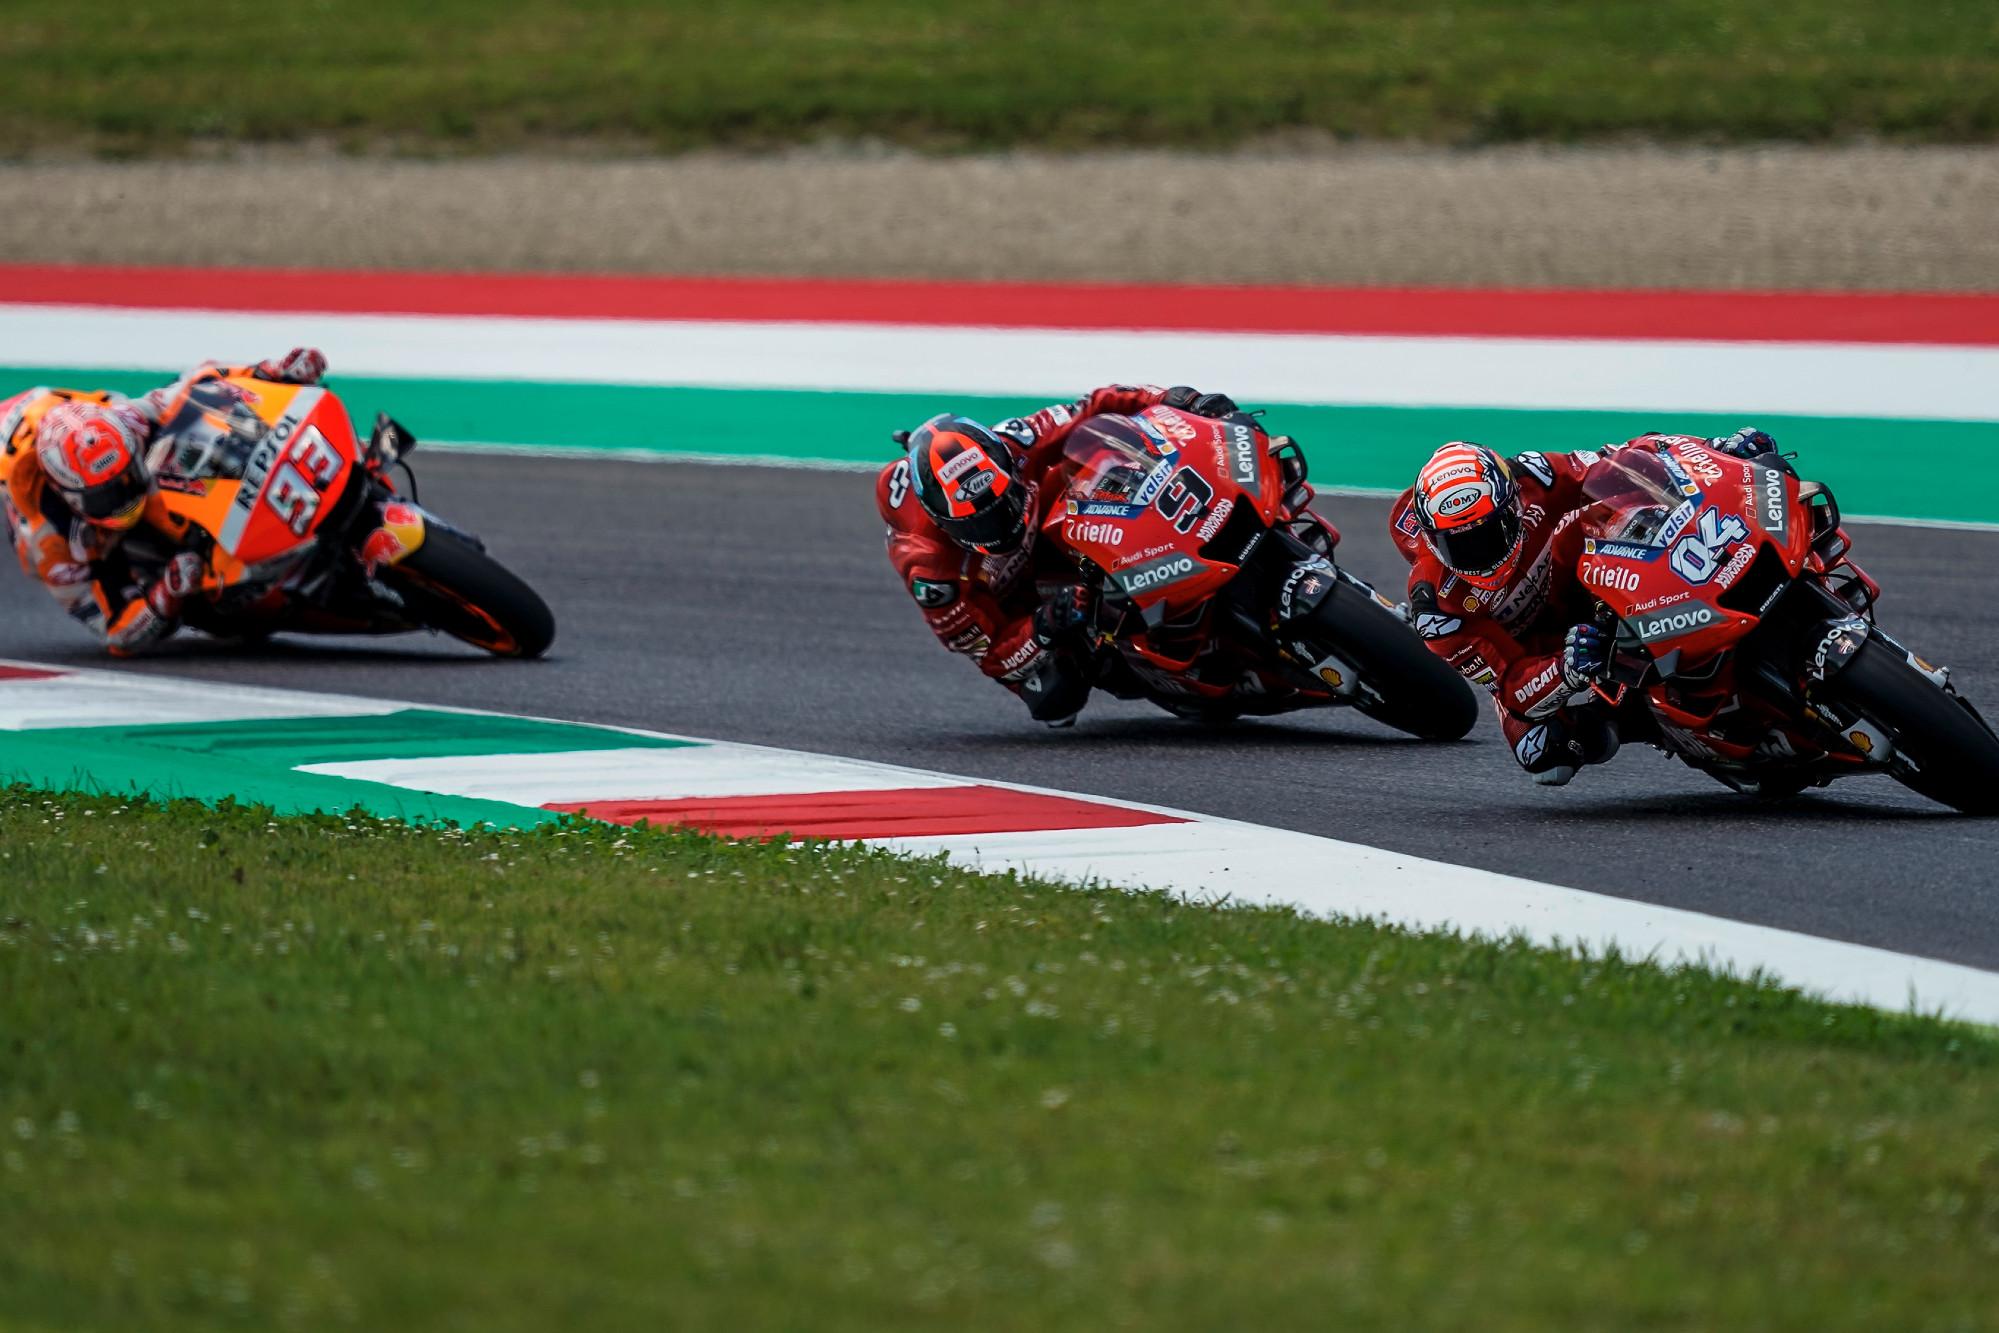 2019 MotoGP Italian GP